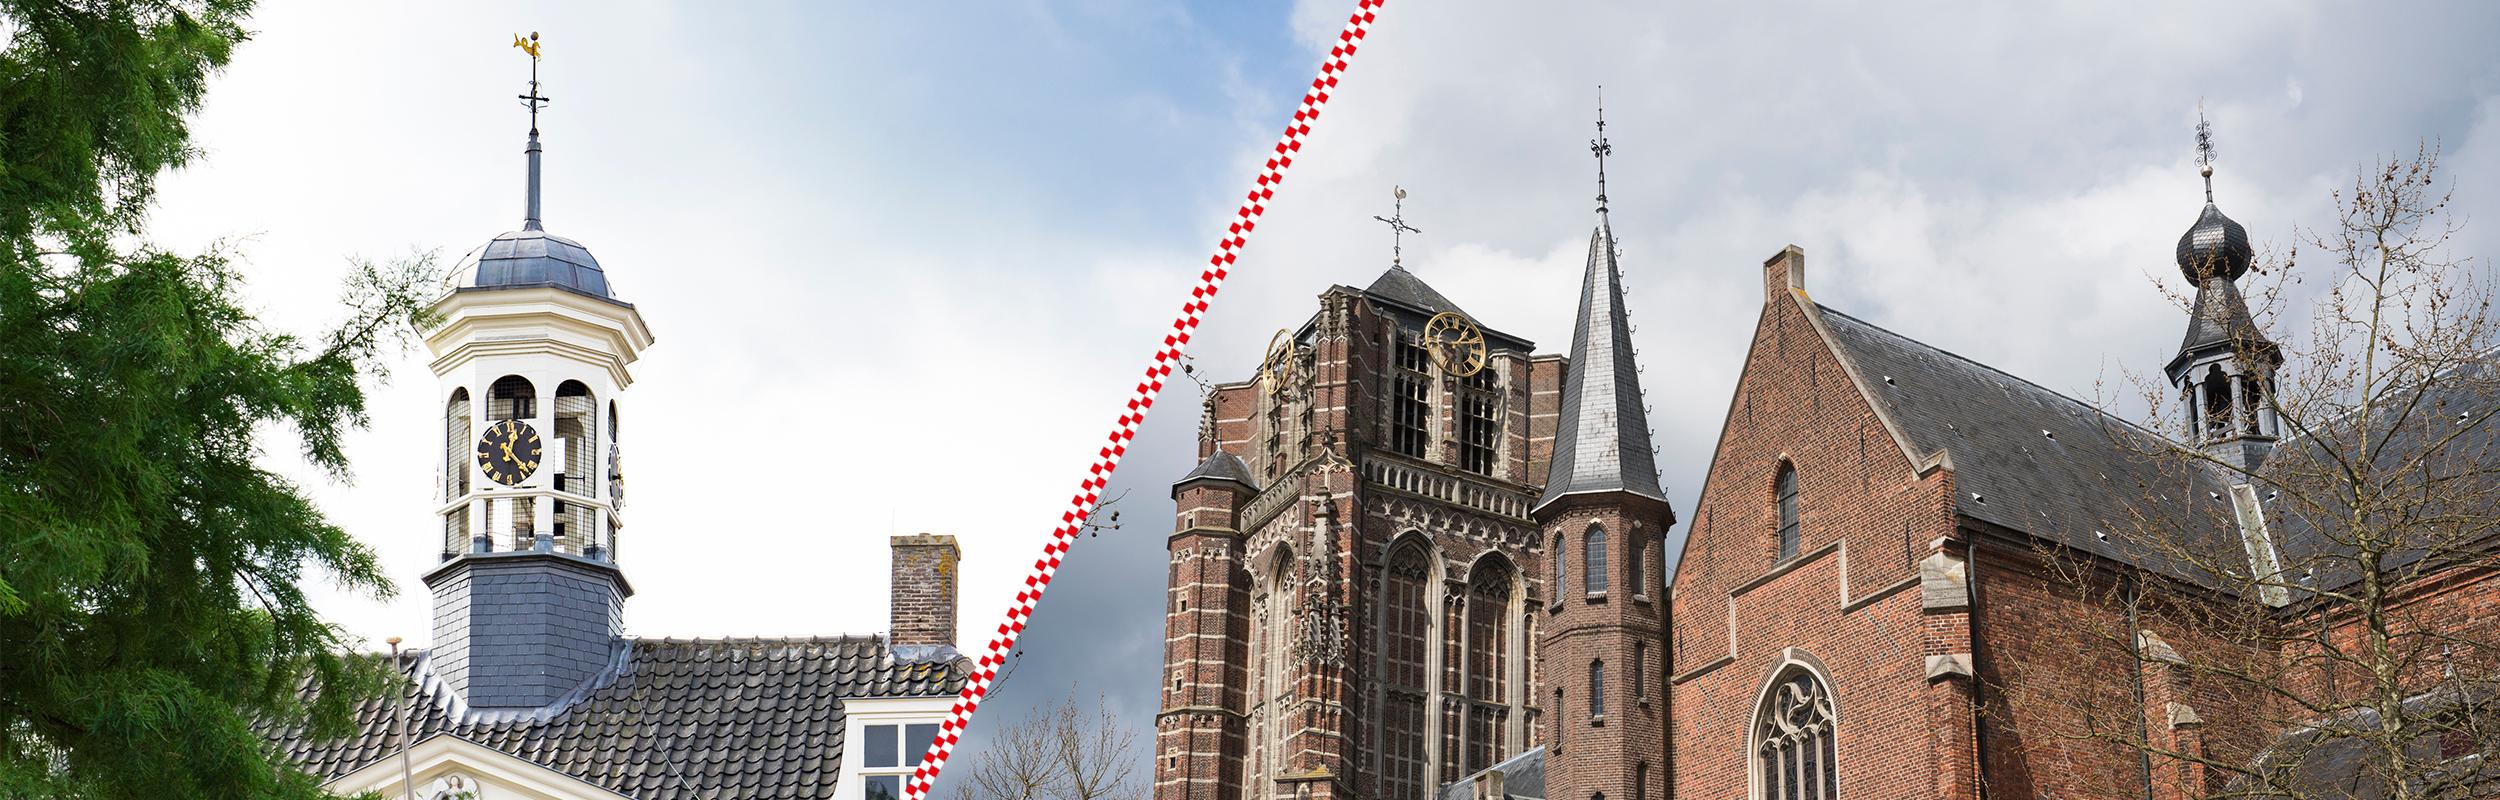 Hopperveld_Dinteloord-Oosterhout